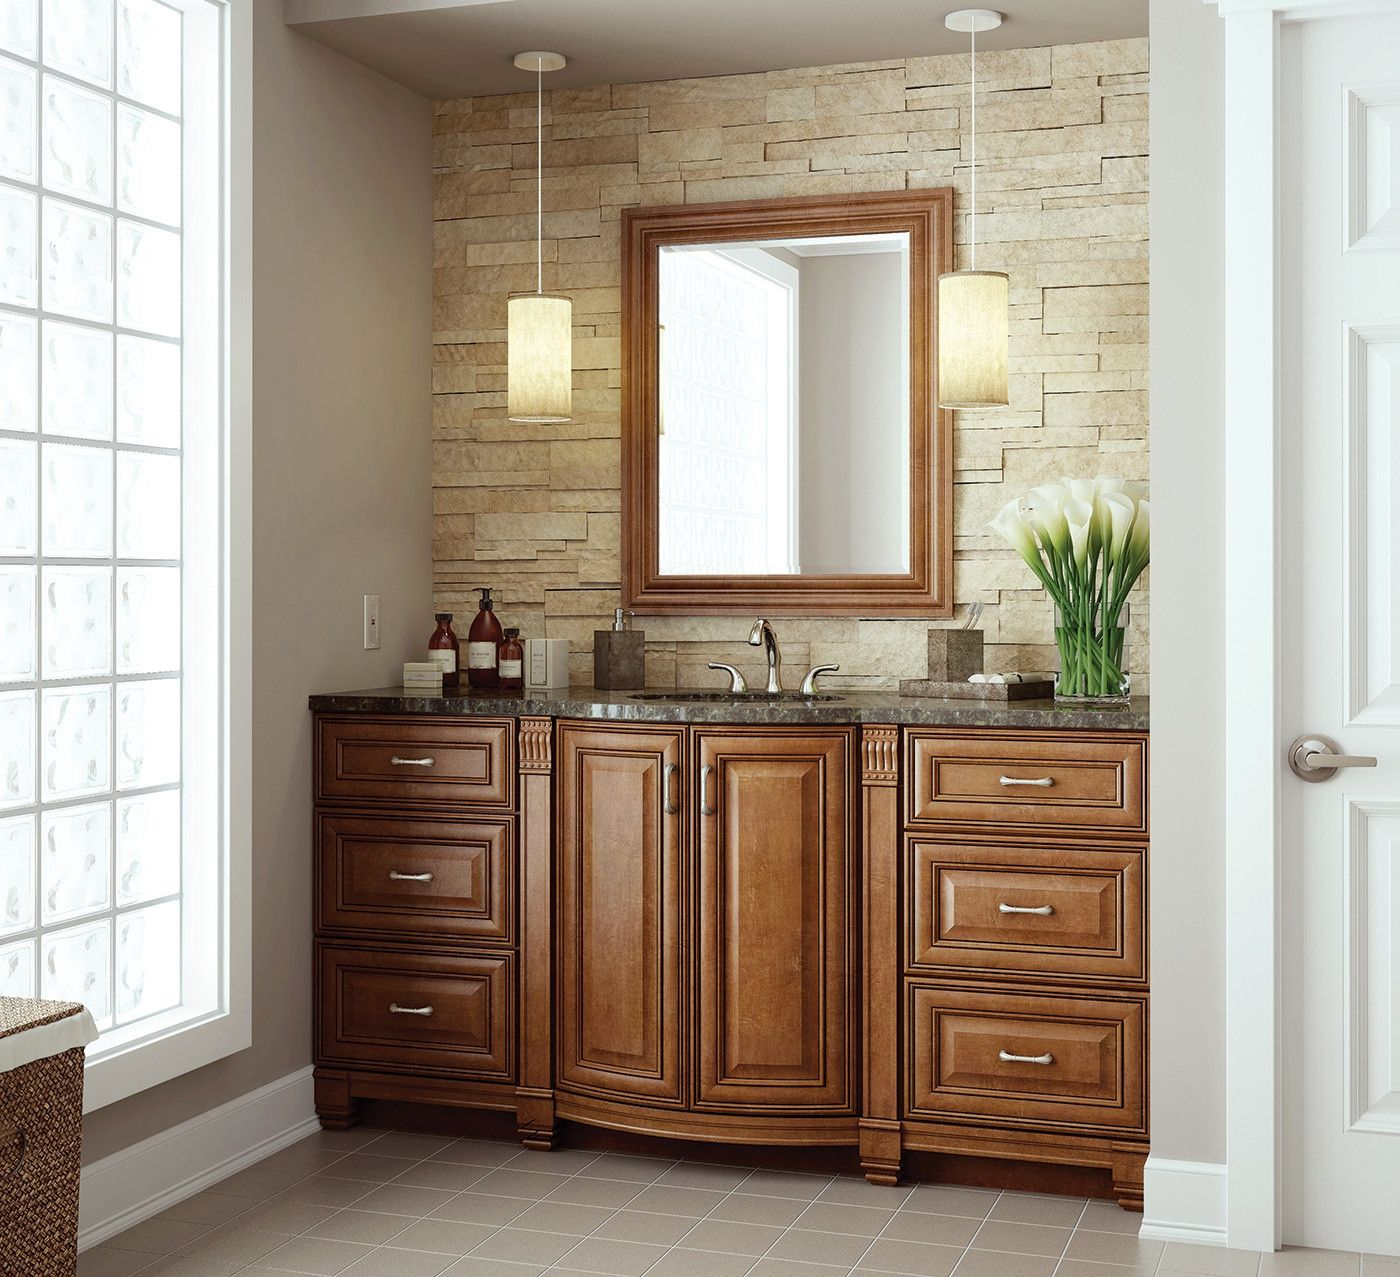 Pin by rahayu12 on interior analogi Bathroom